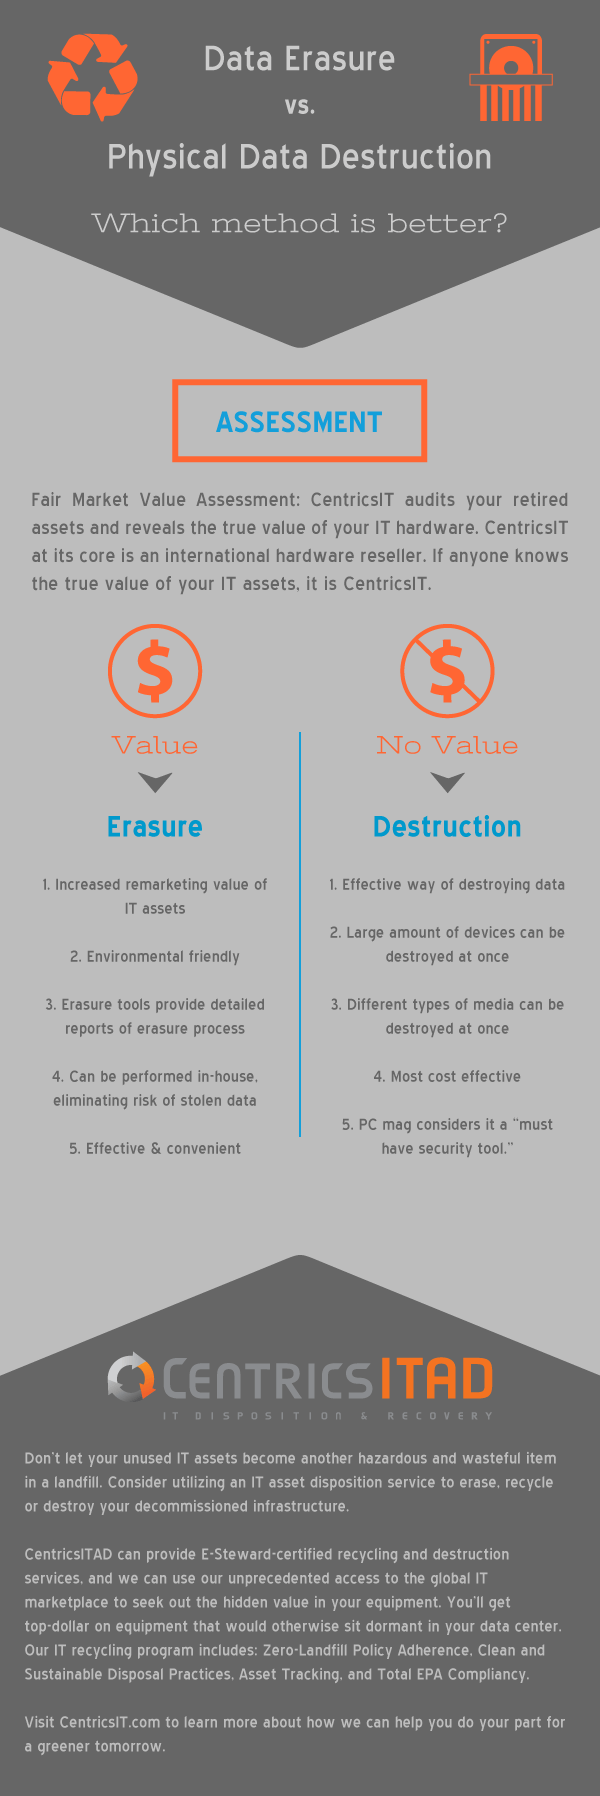 Data Erasure vs Physical Data Destruction